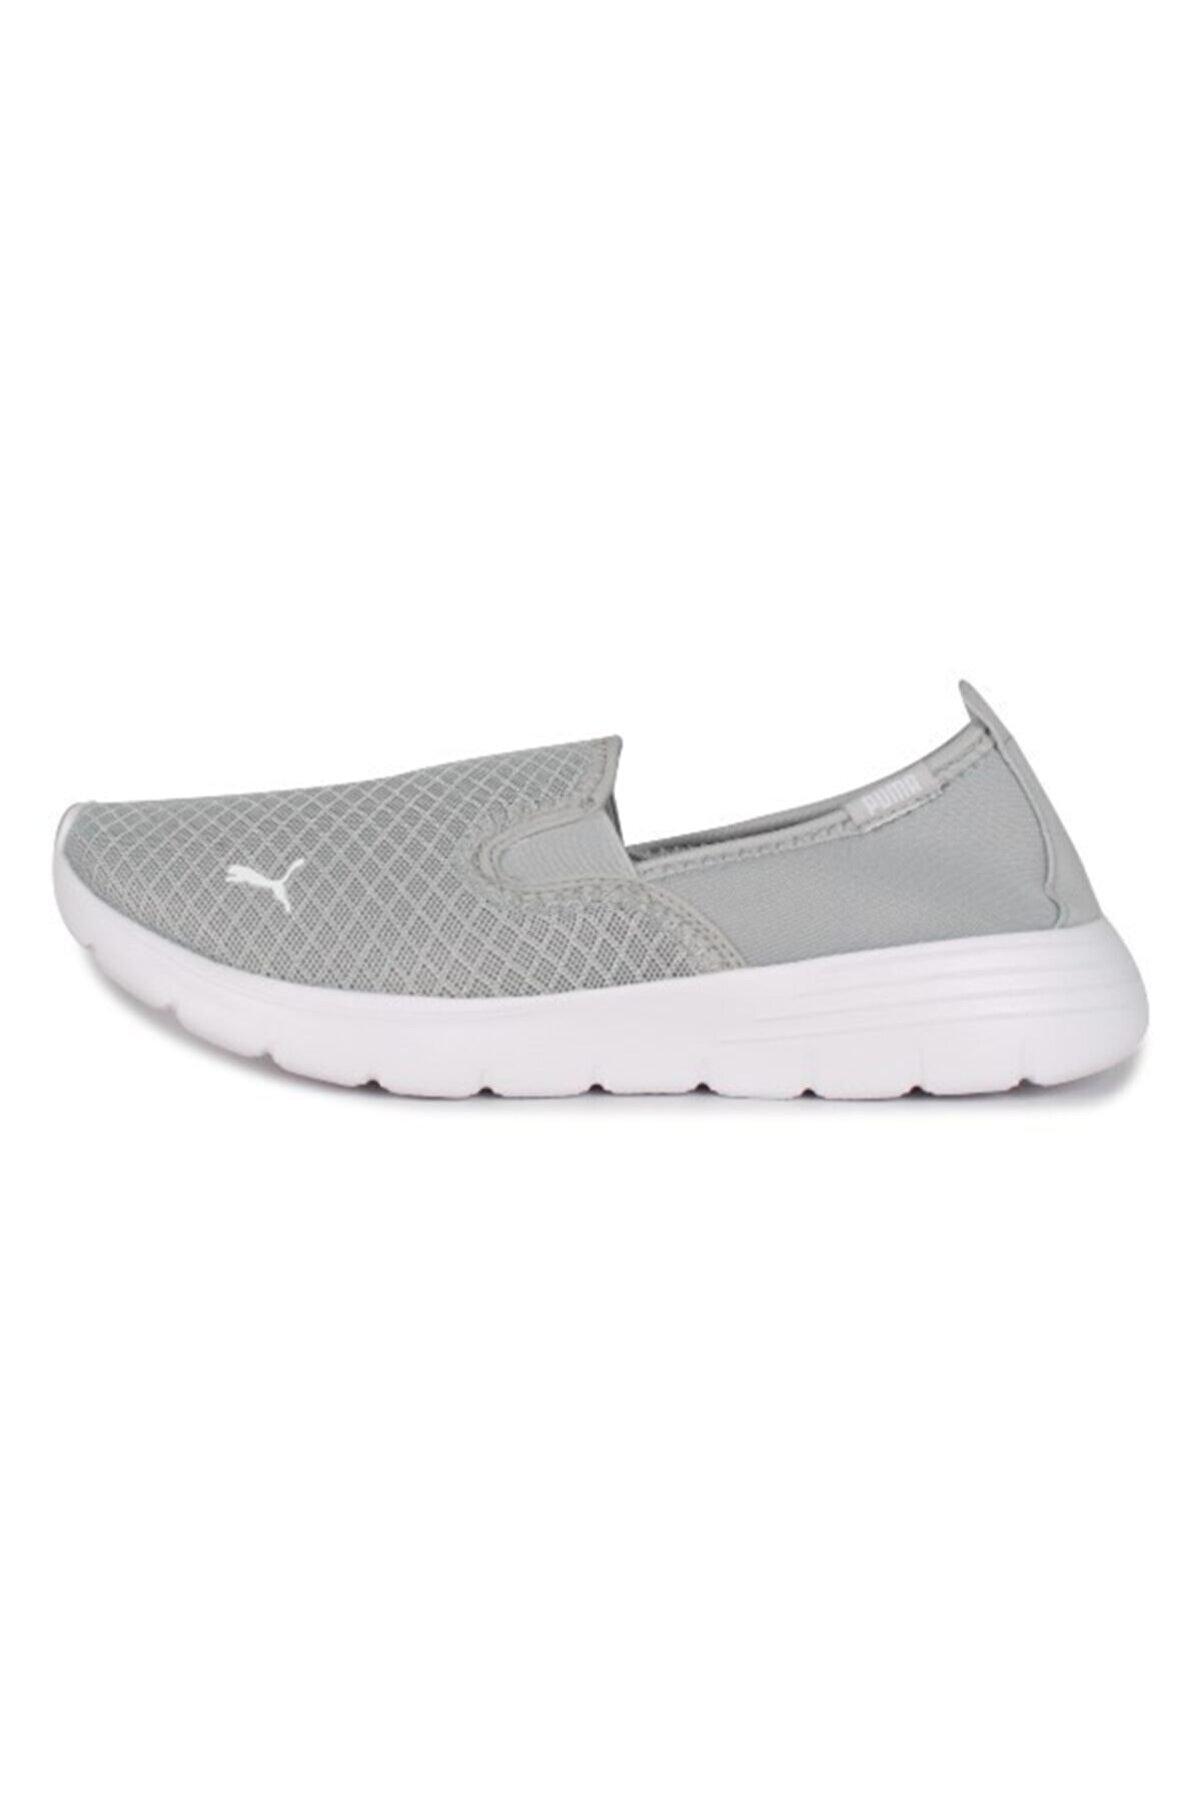 Puma Flex Renew Bağcıksız Ayakkabı